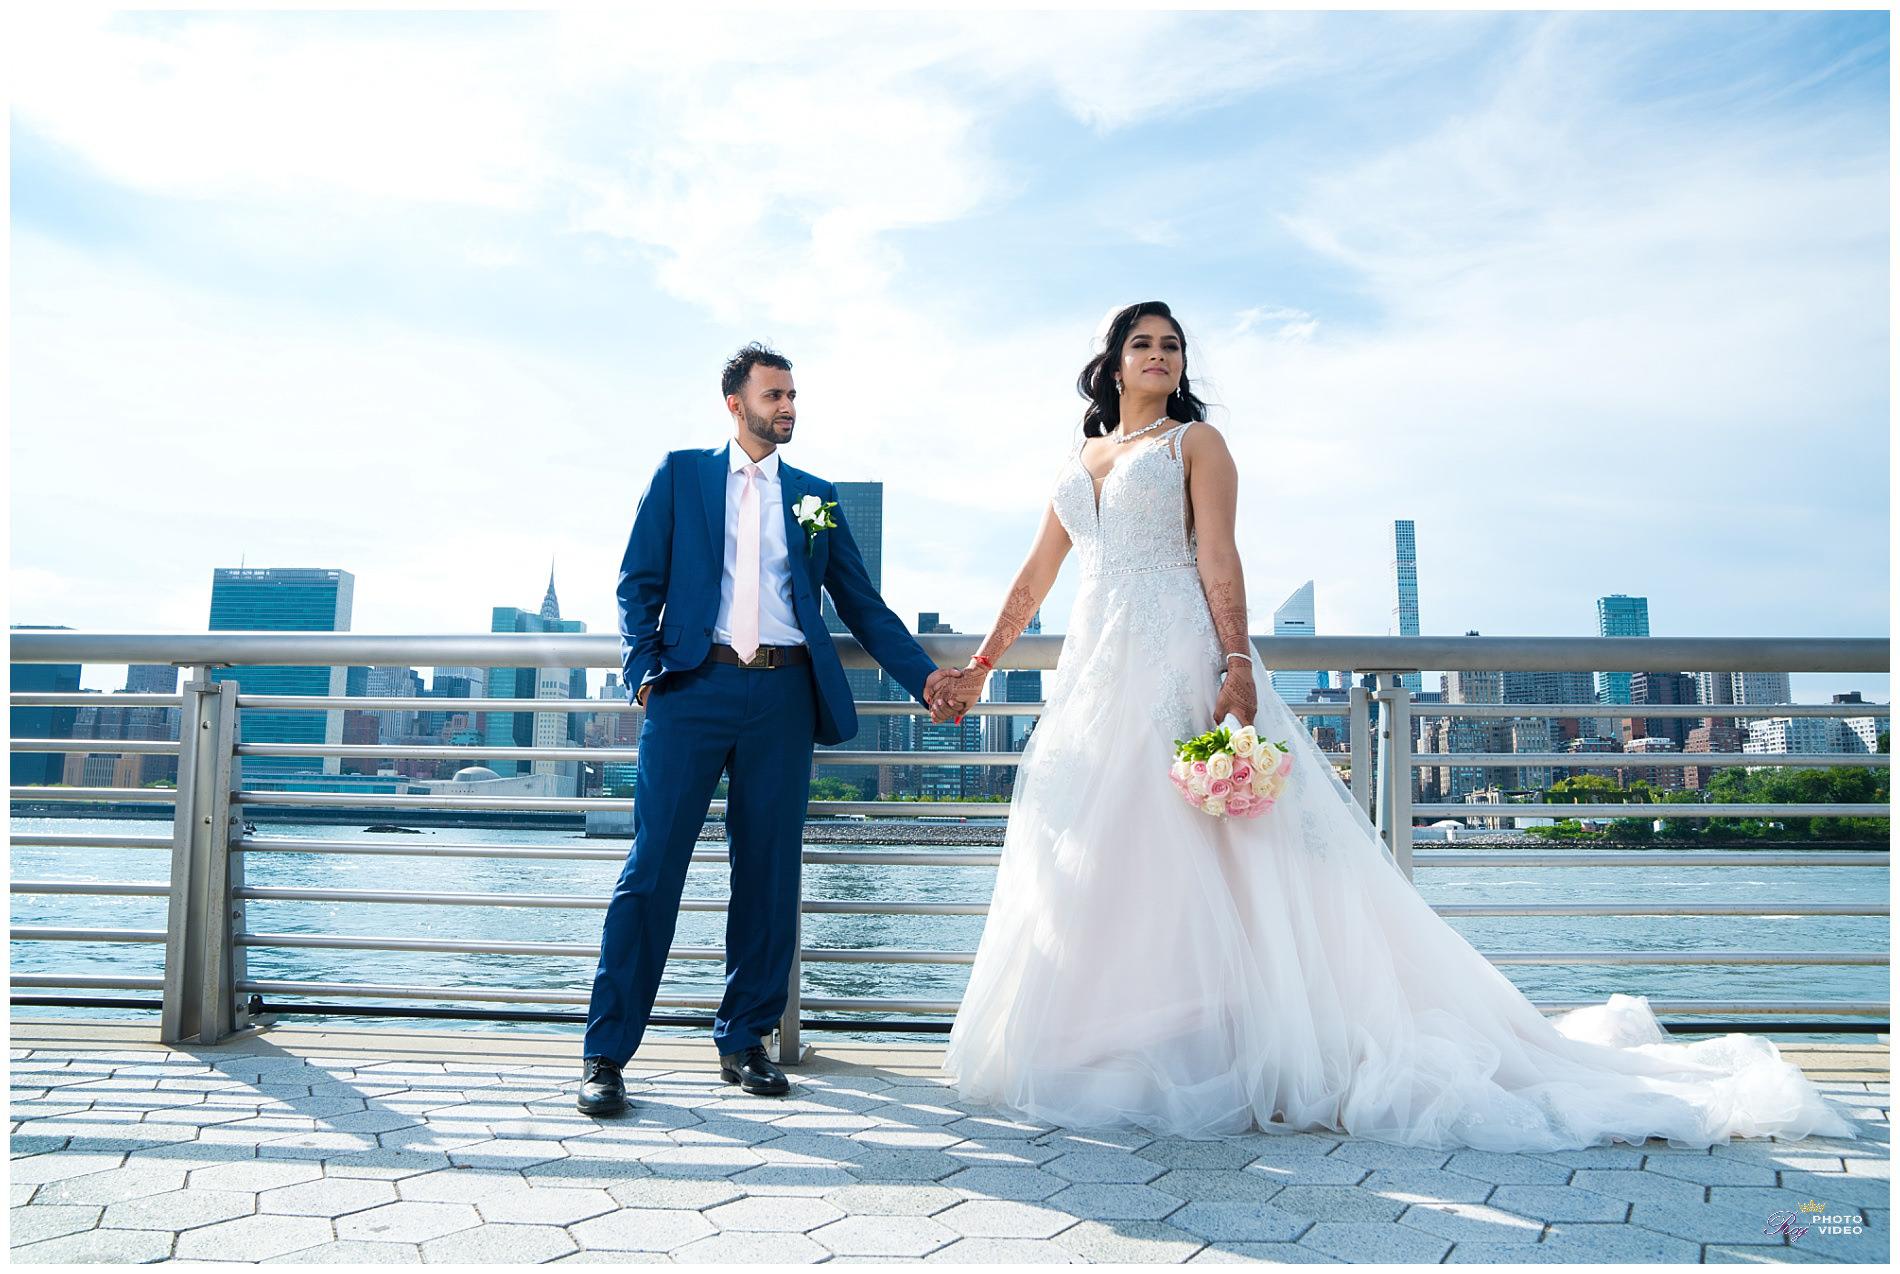 F Woodhaven Manor Woodhaven Ny Hindu Wedding Veann Mario